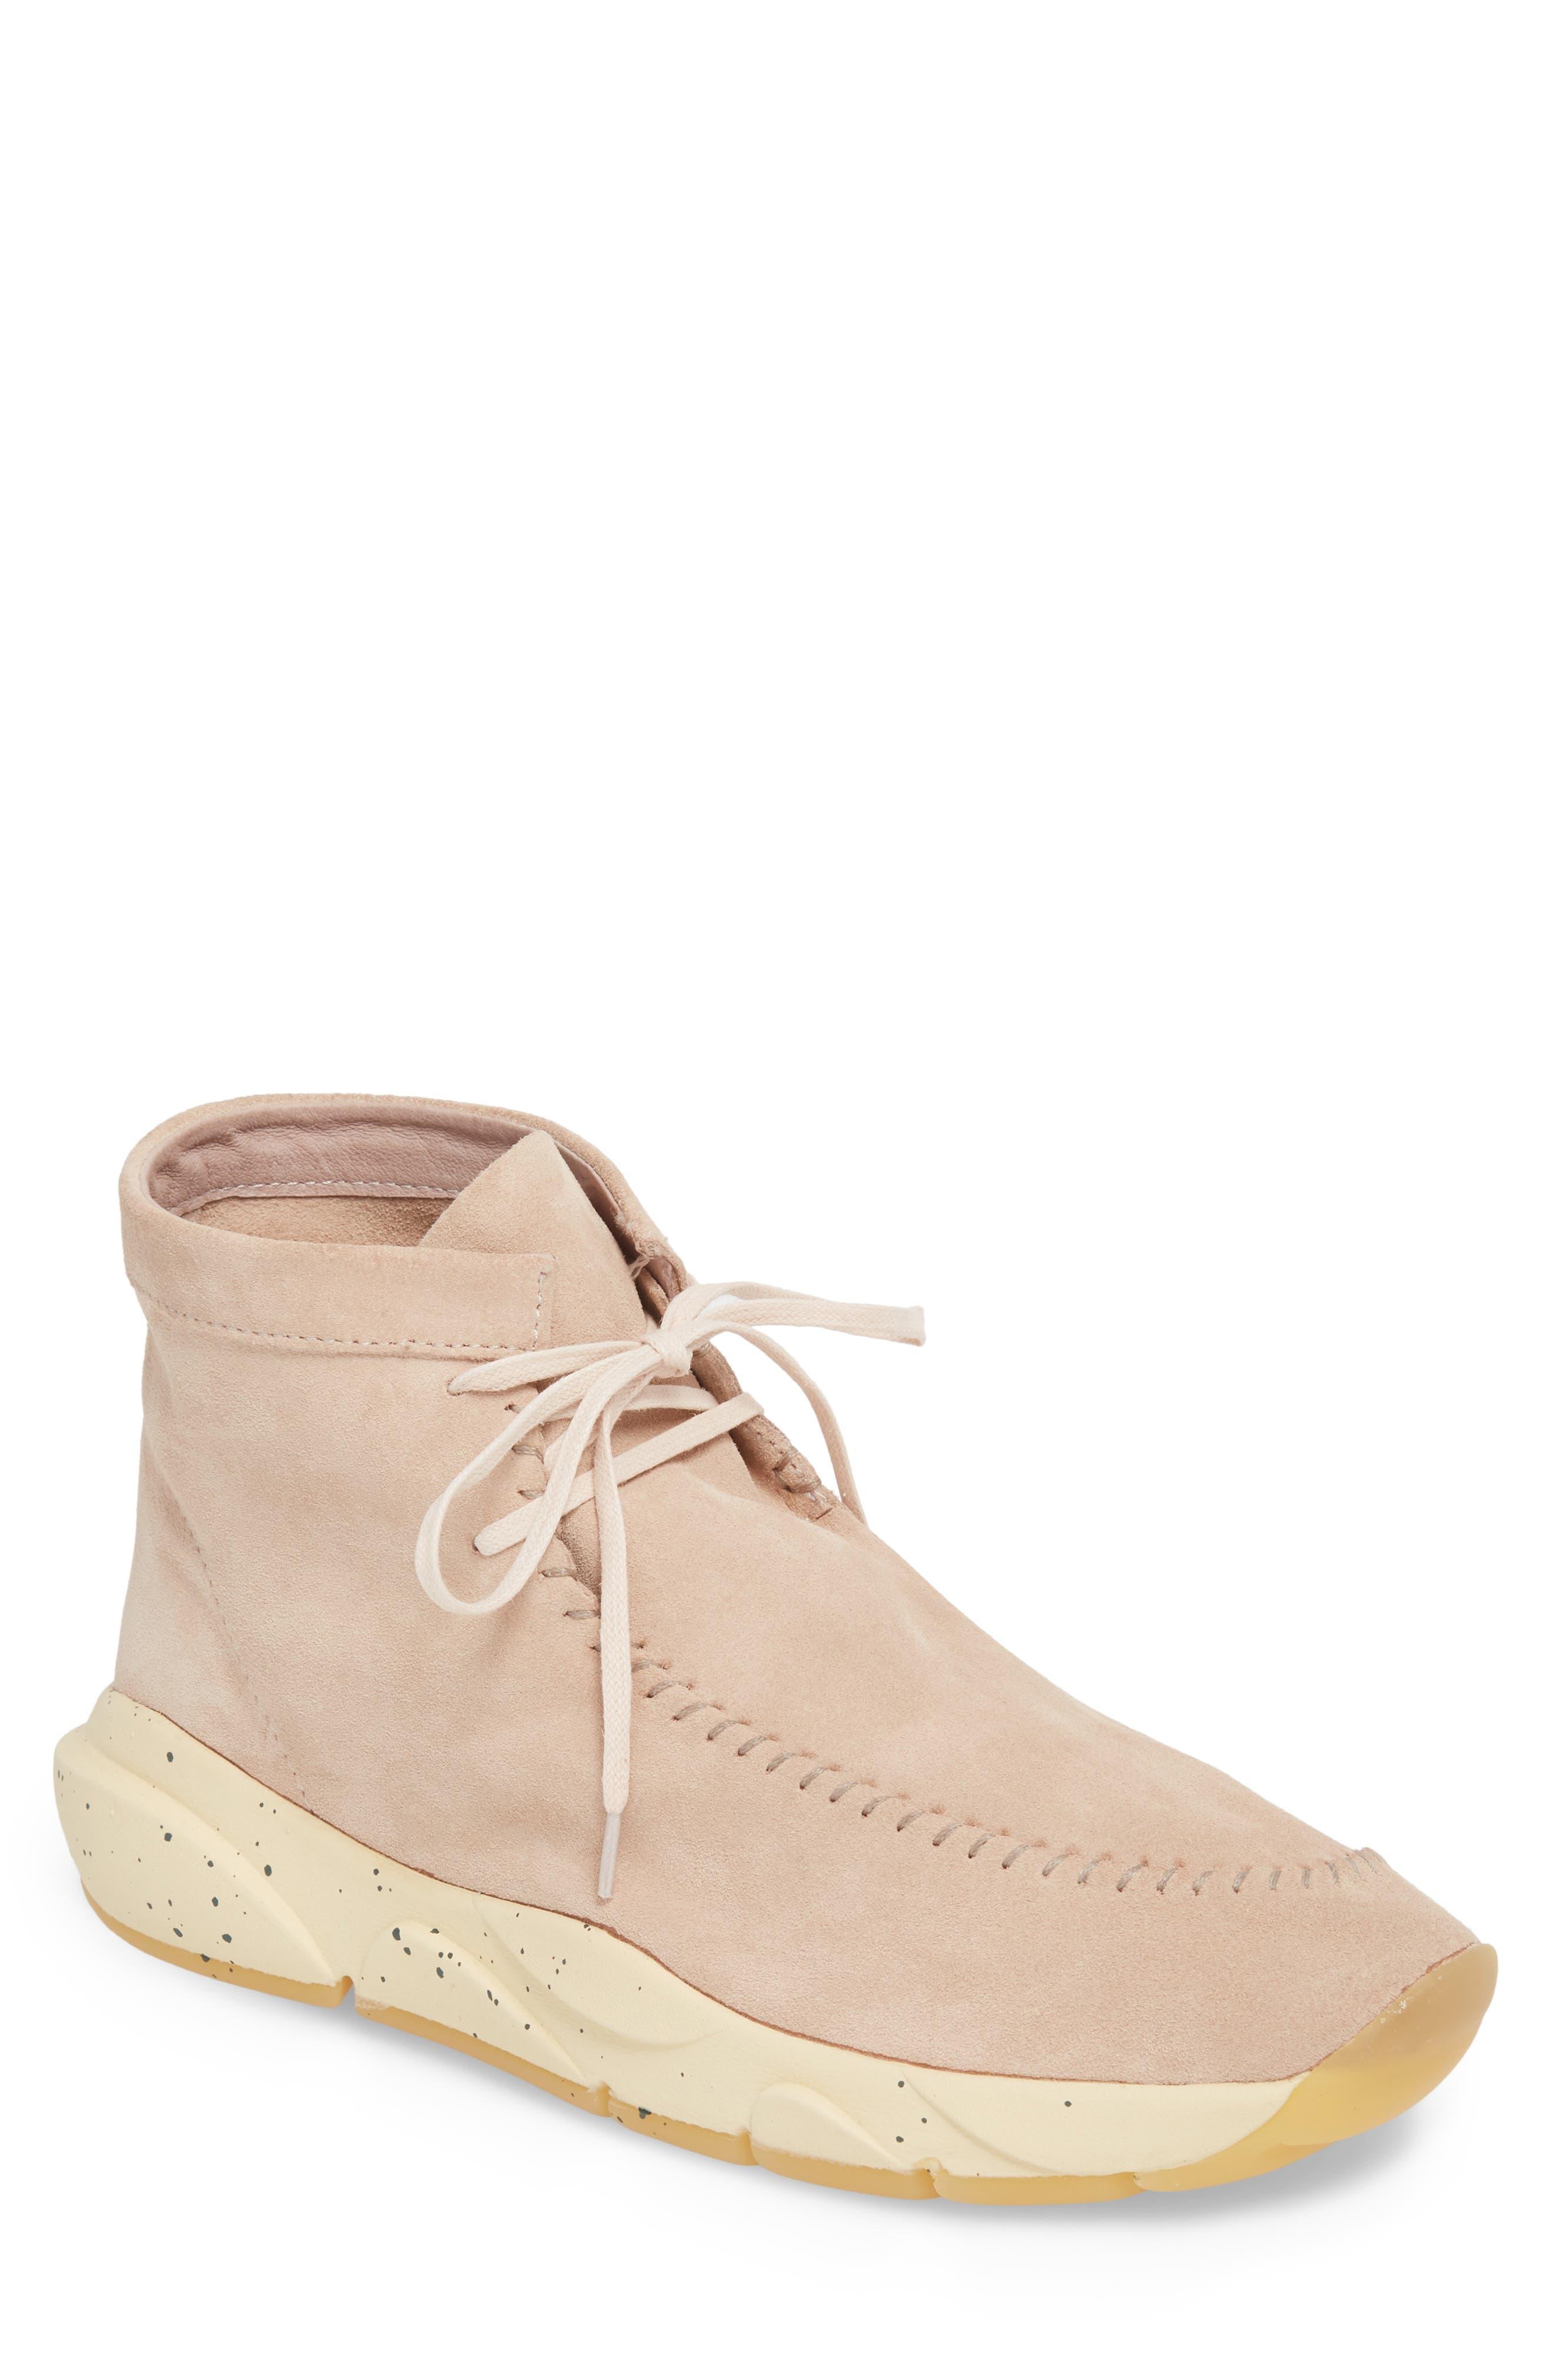 Castas Asymmetrical Chukka Sneaker,                         Main,                         color, Rose Dust